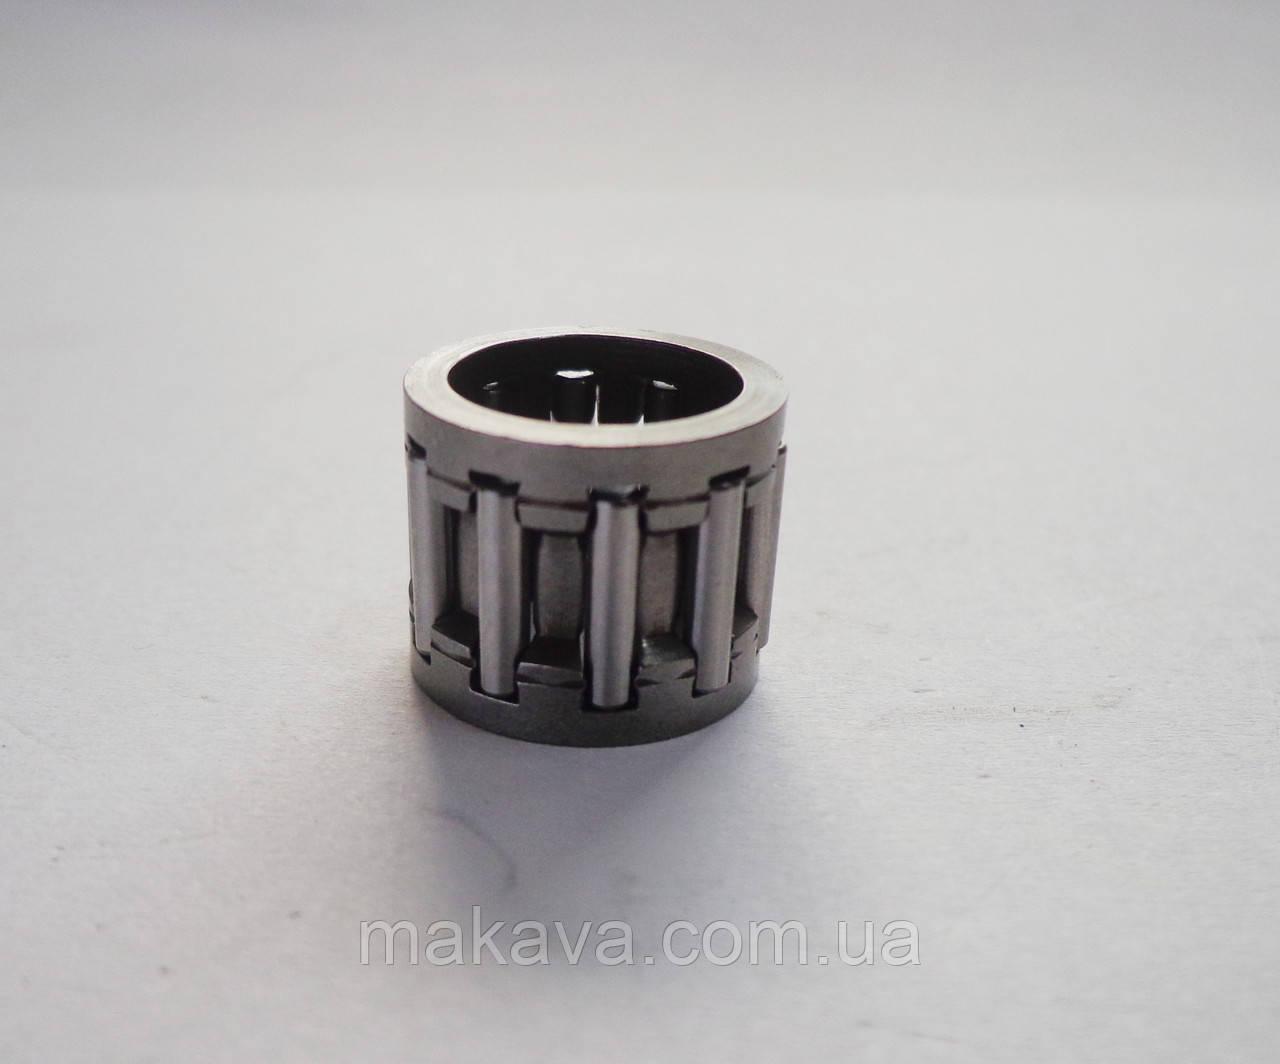 Сепаратор тарелки сцепления St MS-180 (10*13*10)